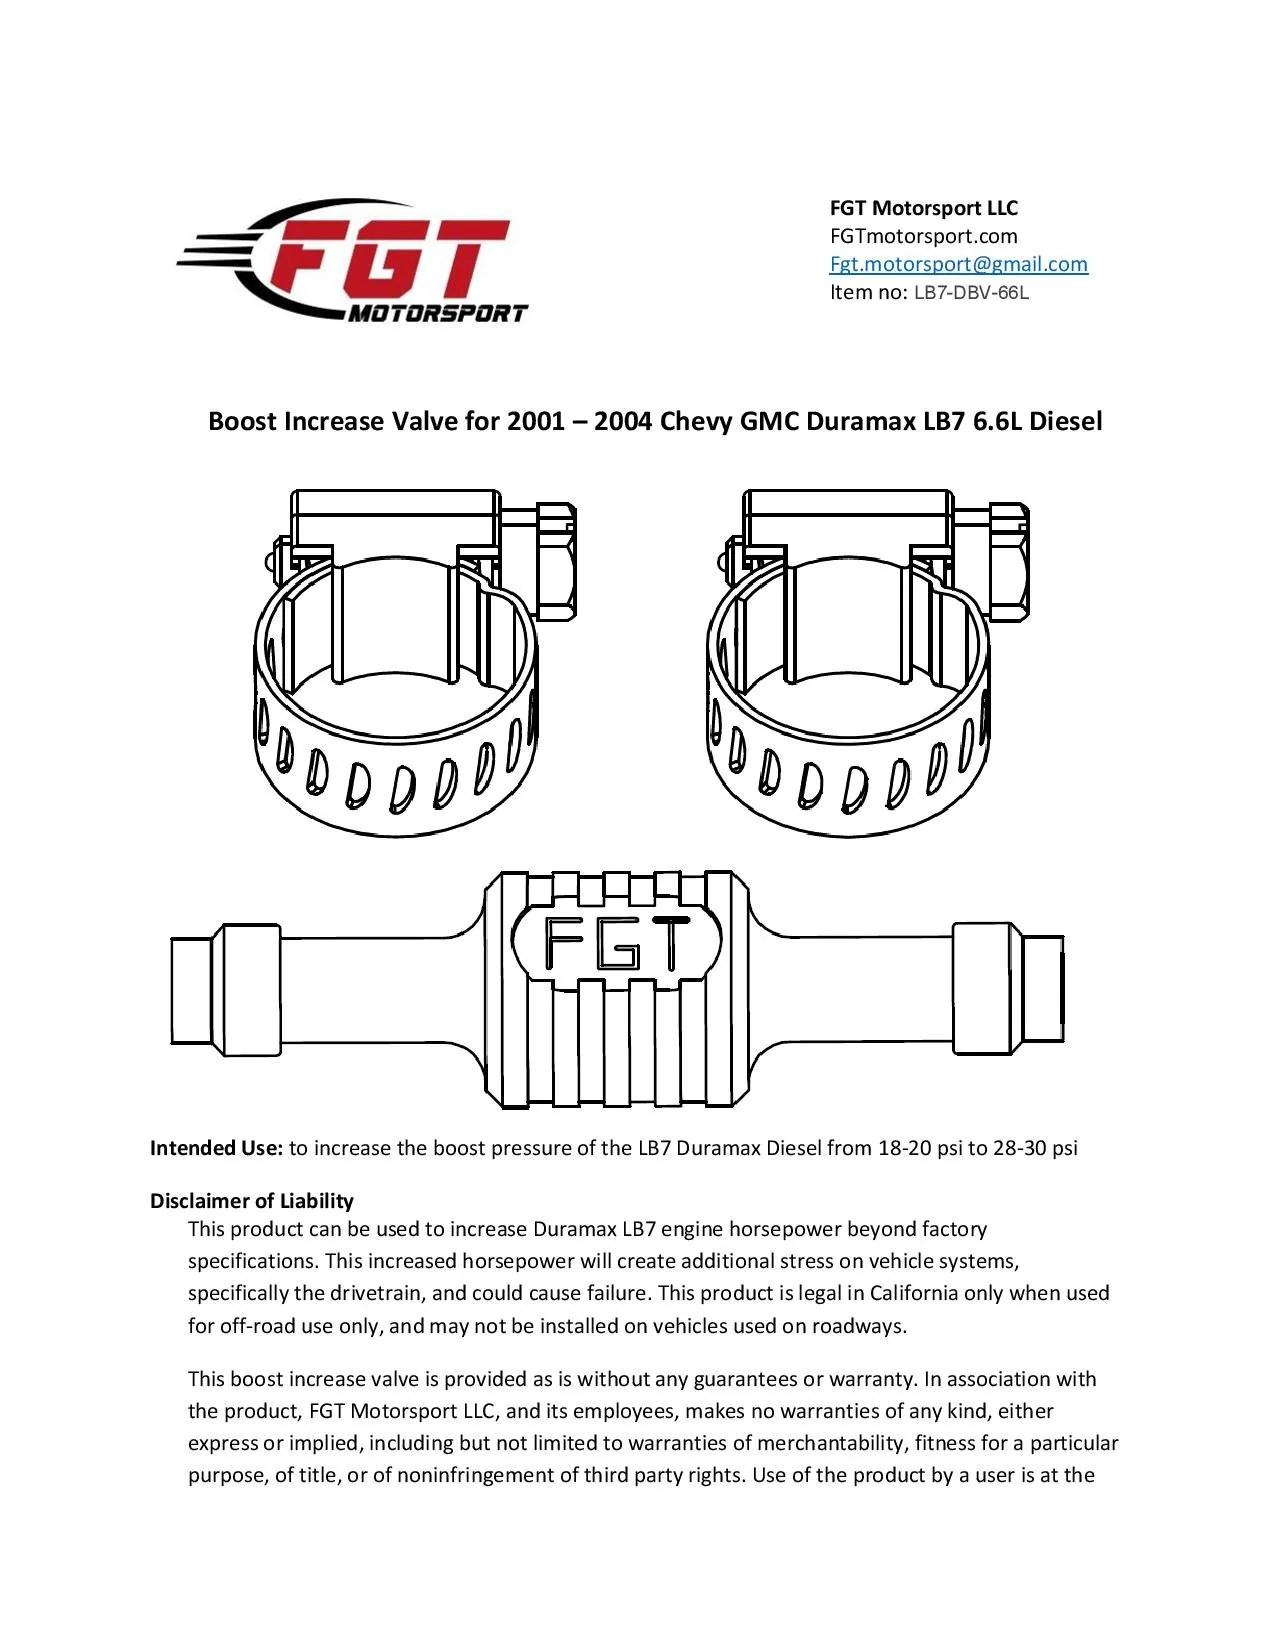 hight resolution of boost increase valve for 01 04 duramax 6 6l lb7 chevy silverado